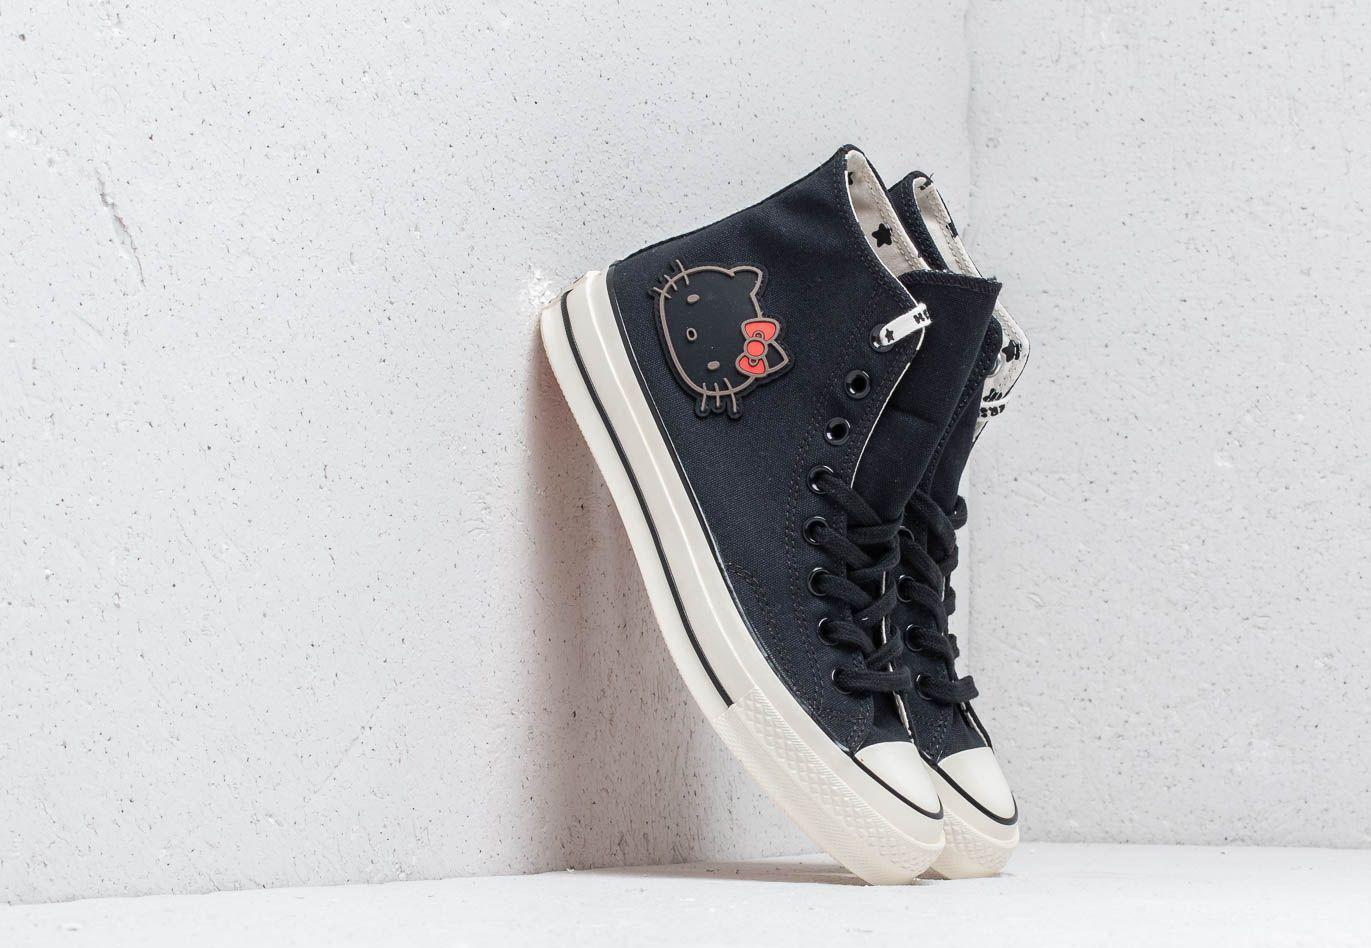 e1234f48a563 Lyst - Converse X Hello Kitty Chuck 70 Hi Black  Black  Egret in ...